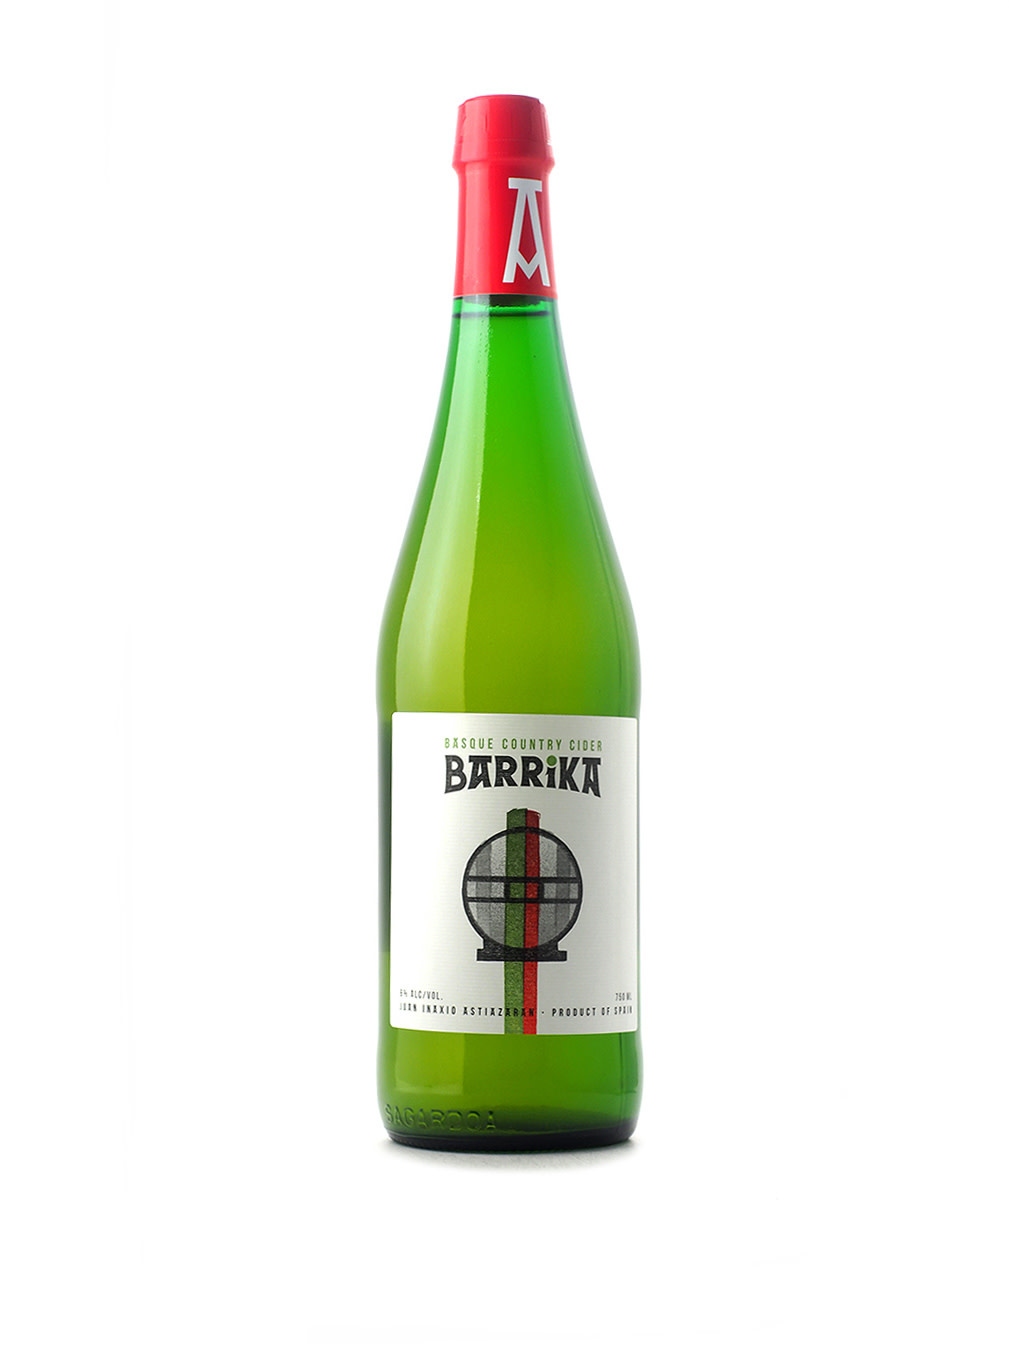 Sidreria Astiazaran Barrika Basque Cider NV